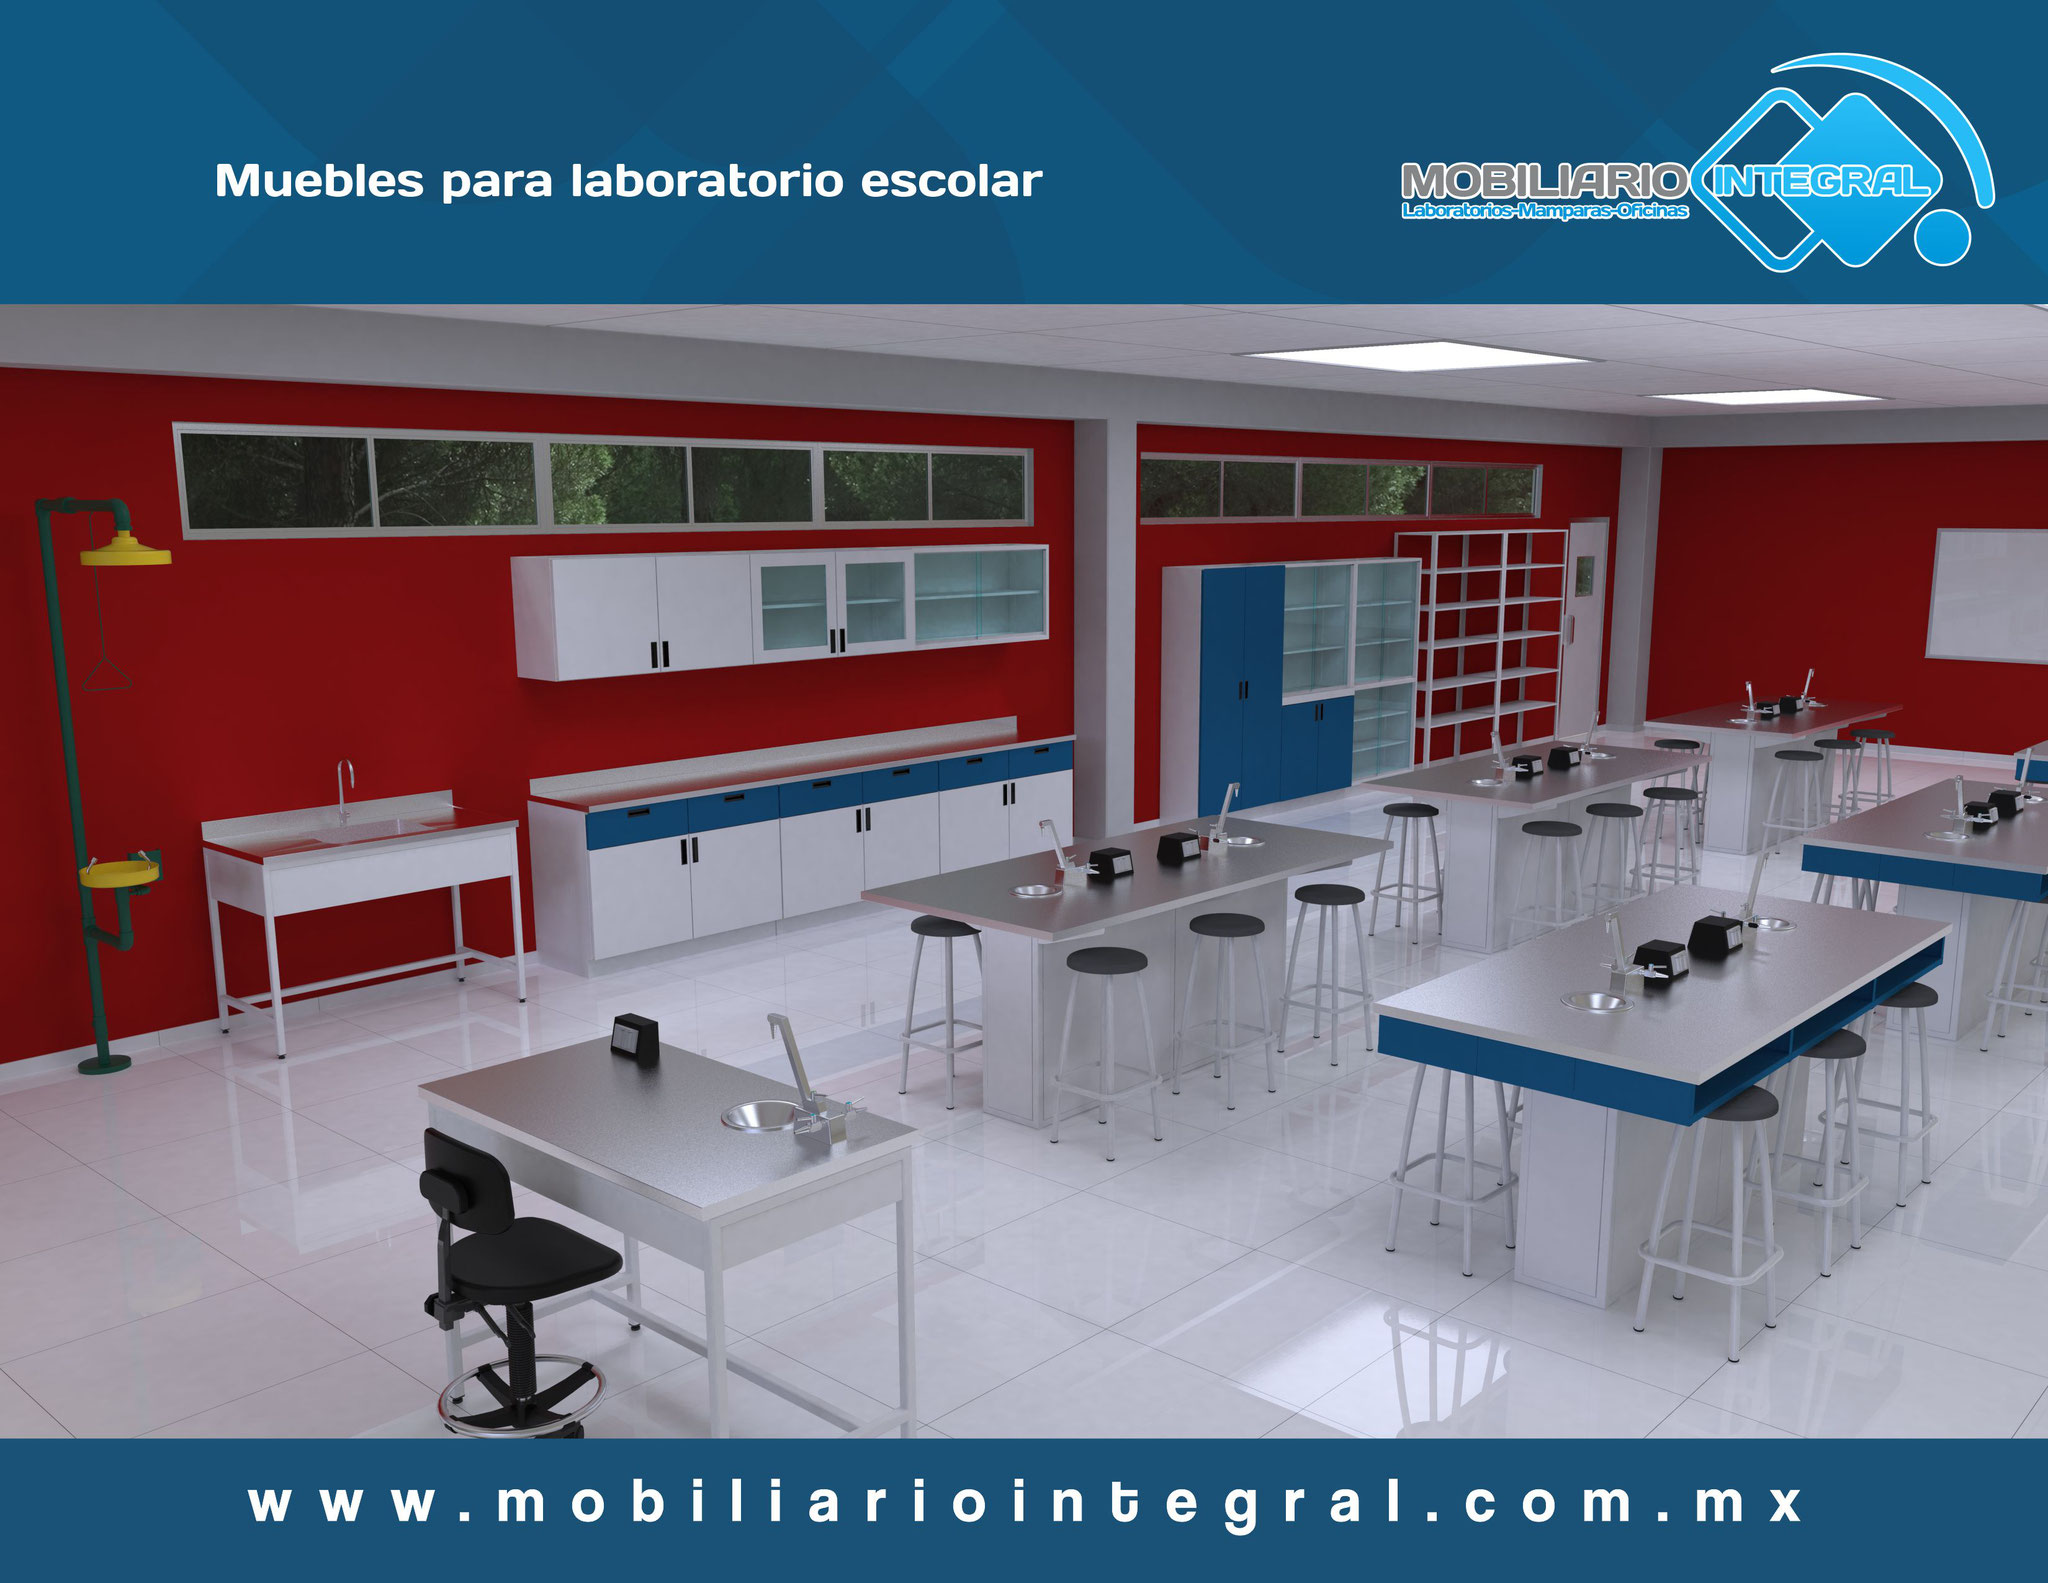 Muebles para laboratorio escolar Sinaloa